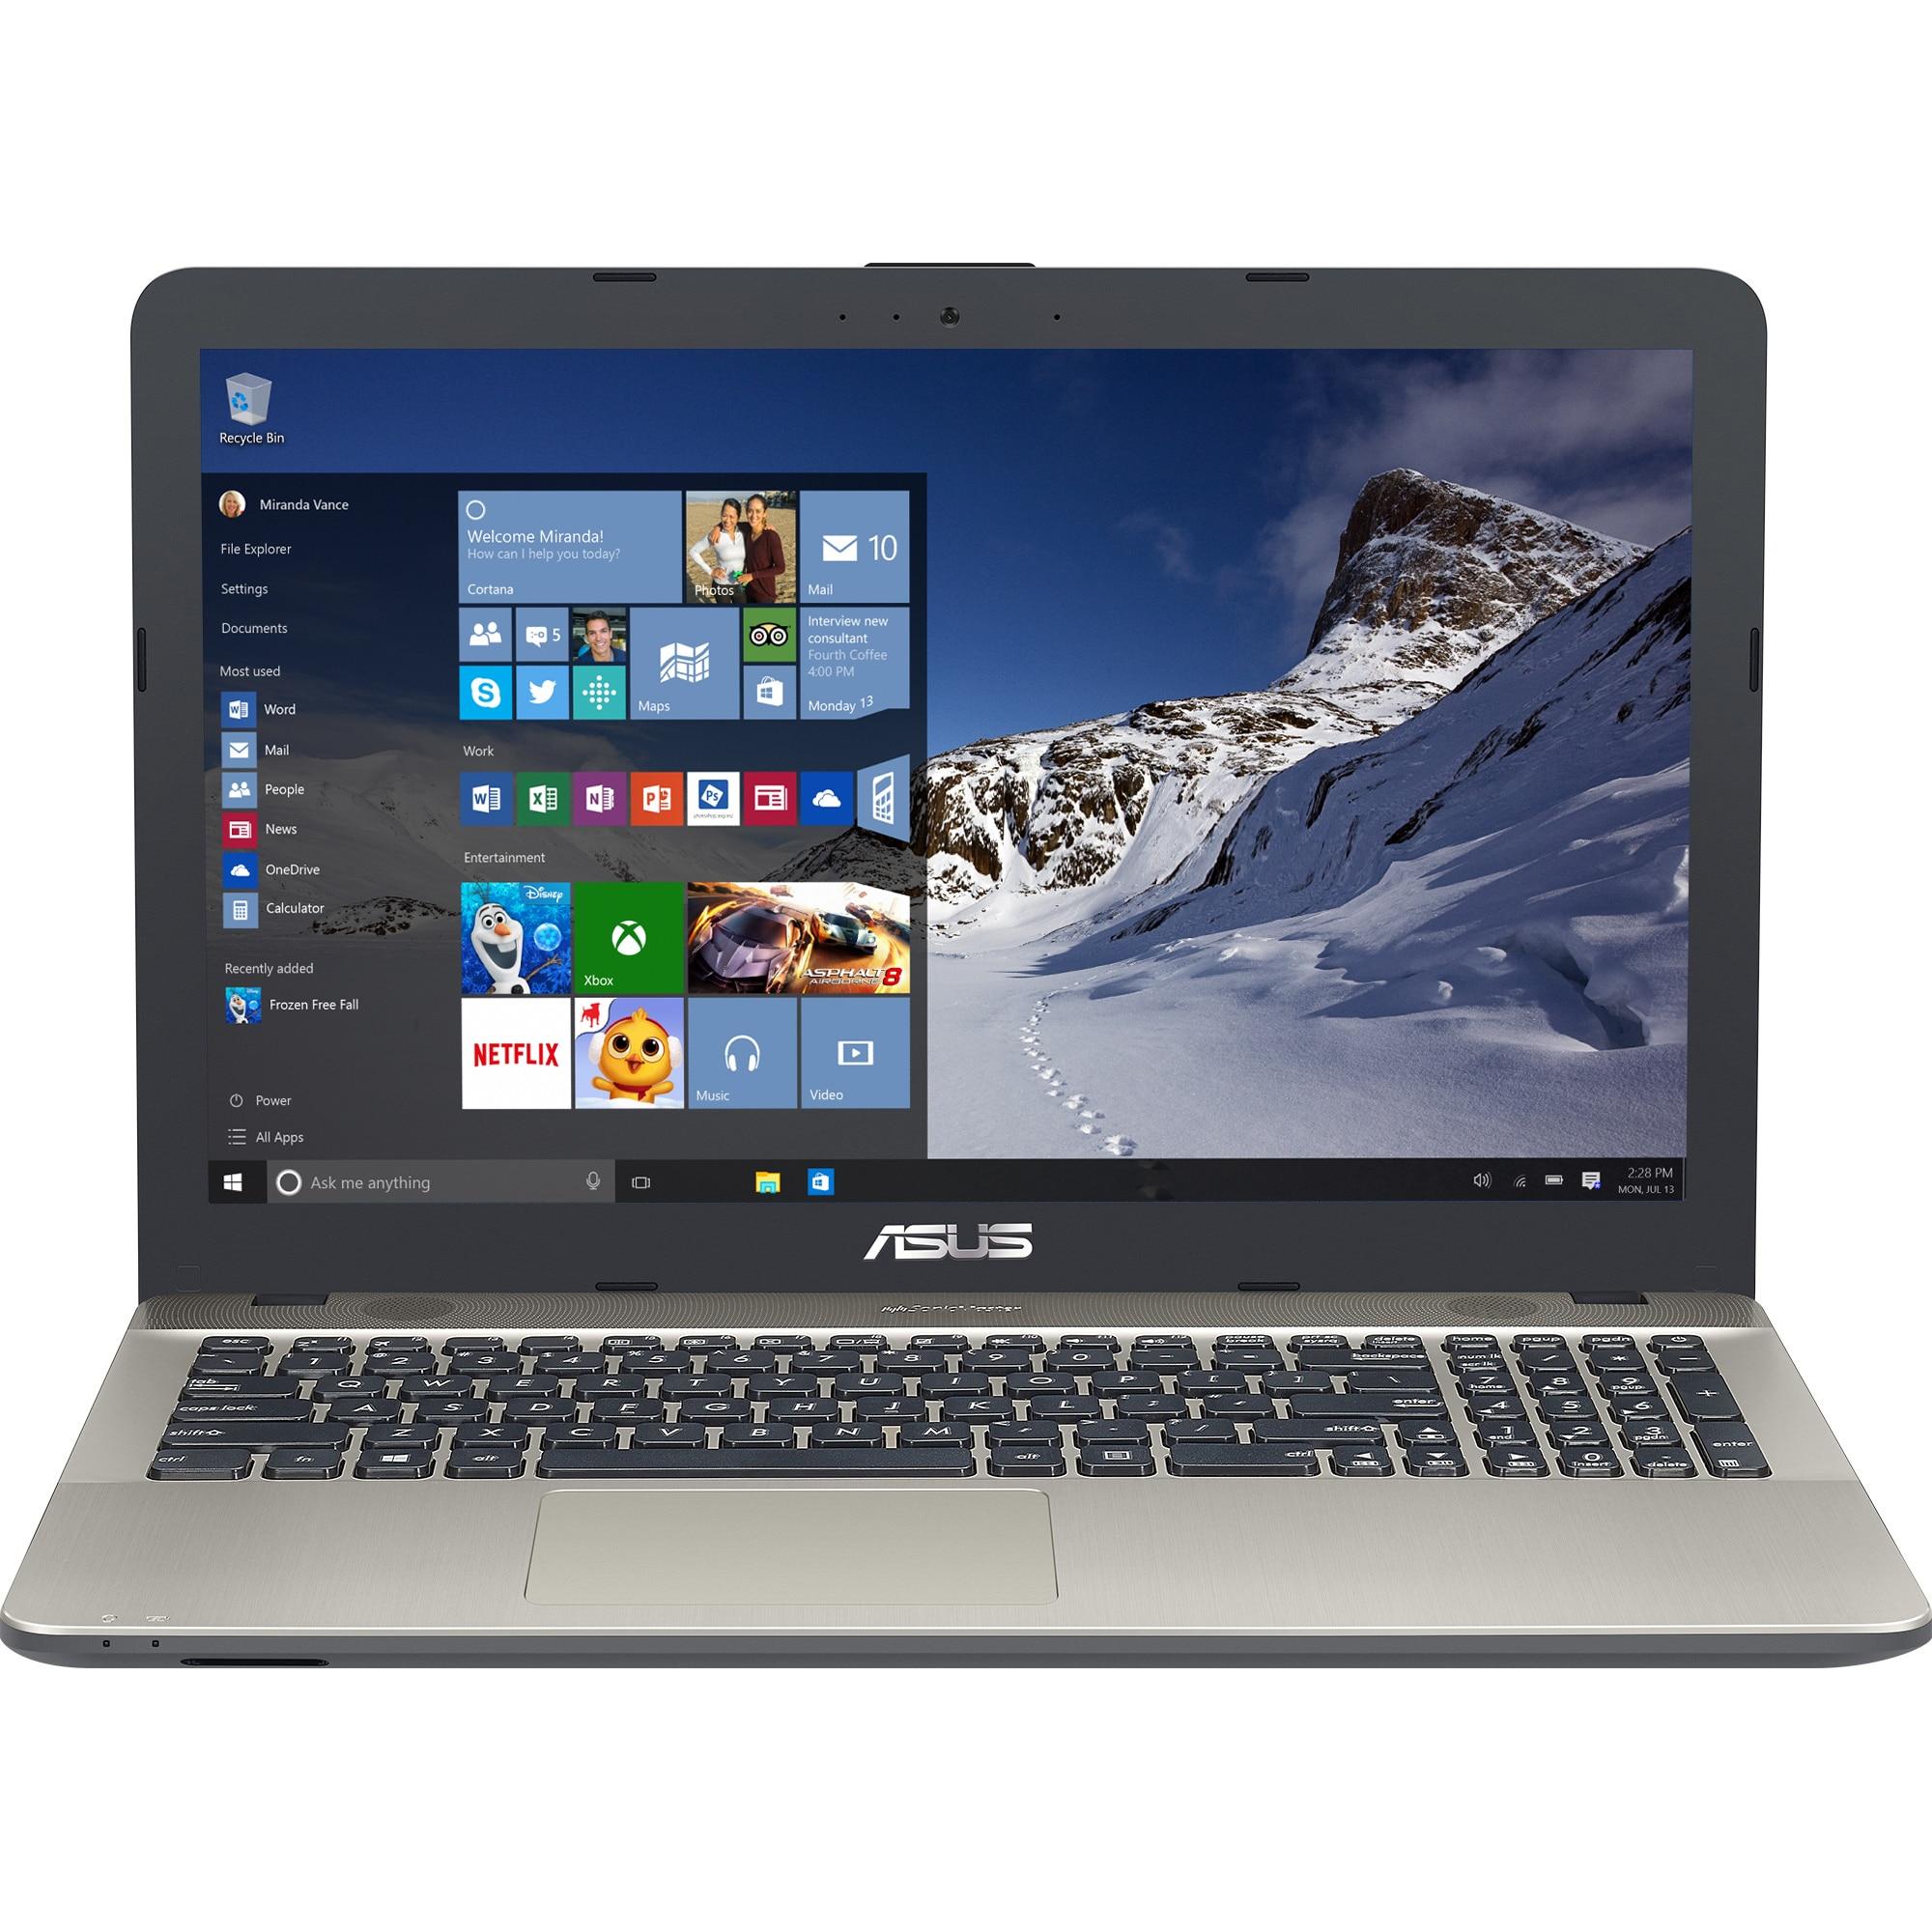 "Fotografie Laptop ASUS X541UA-GO1372T cu procesor Intel® Core™ i3-7100U 2.40 GHz, Kaby Lake, 15.6"", 4GB, 1TB, DVD-RW, Intel® HD Graphics 620, Windows 10, Chocolate Black"